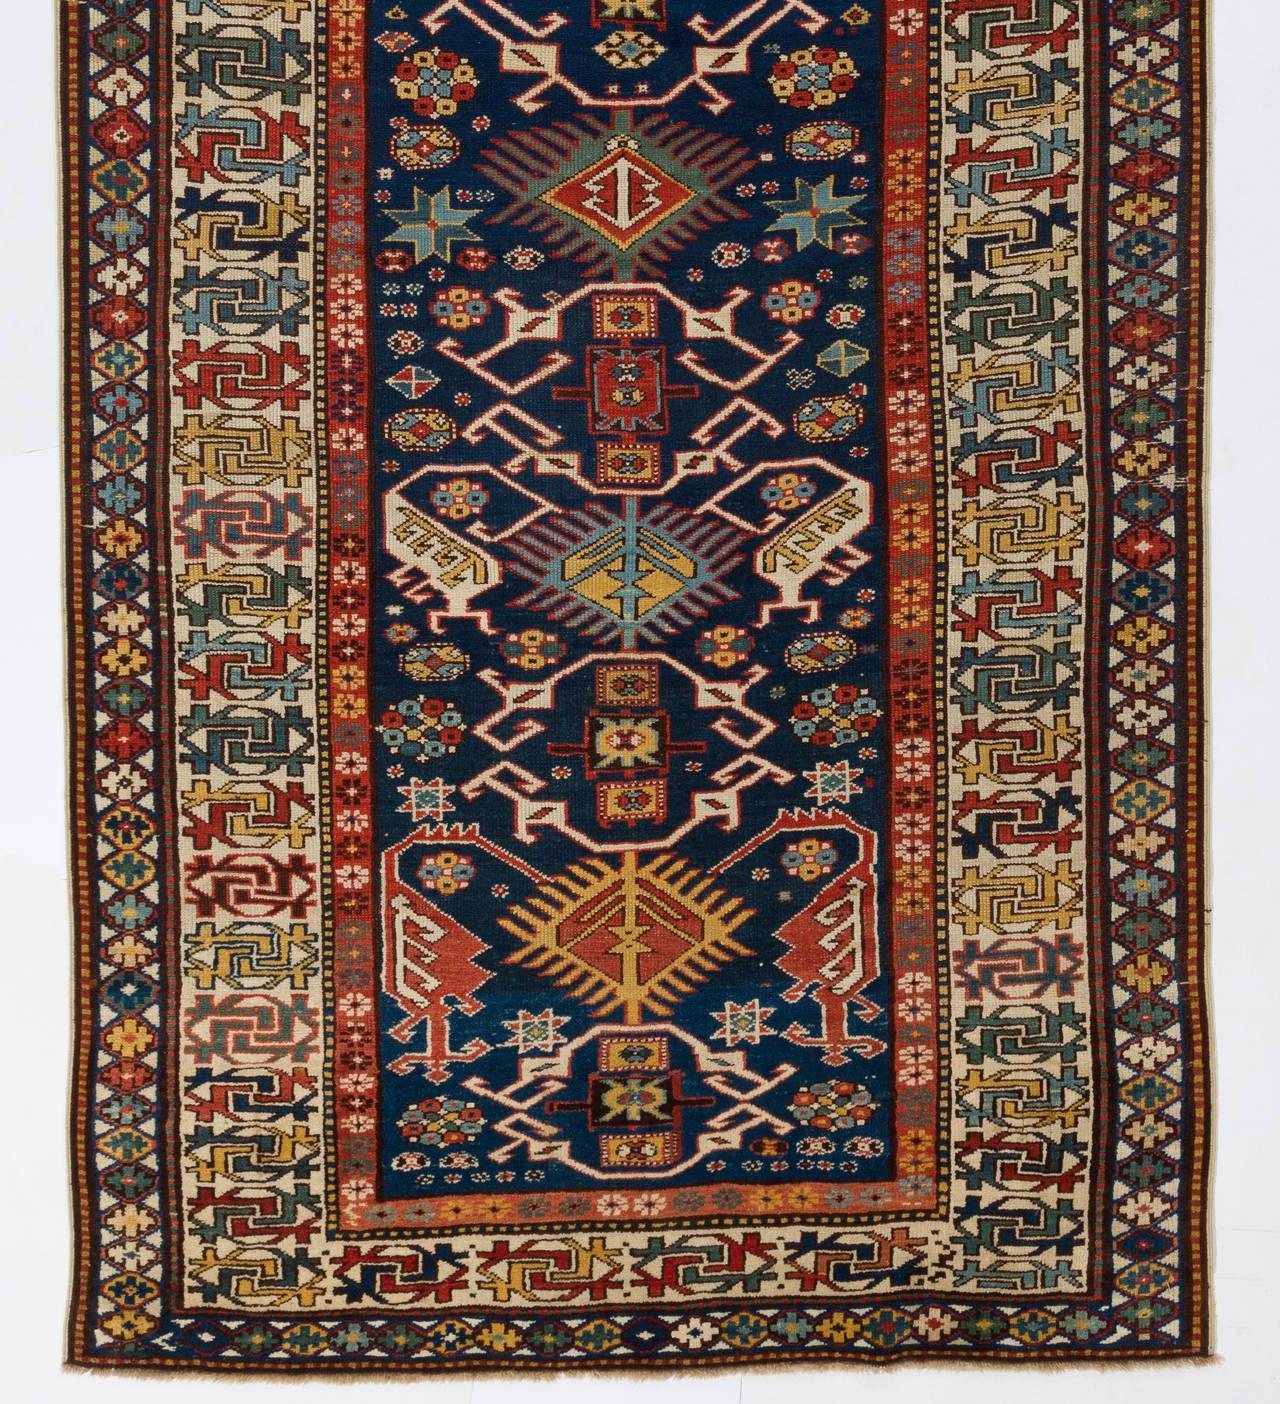 Antique Caucasian Shirvan Bidjov Rug For Sale At 1stdibs